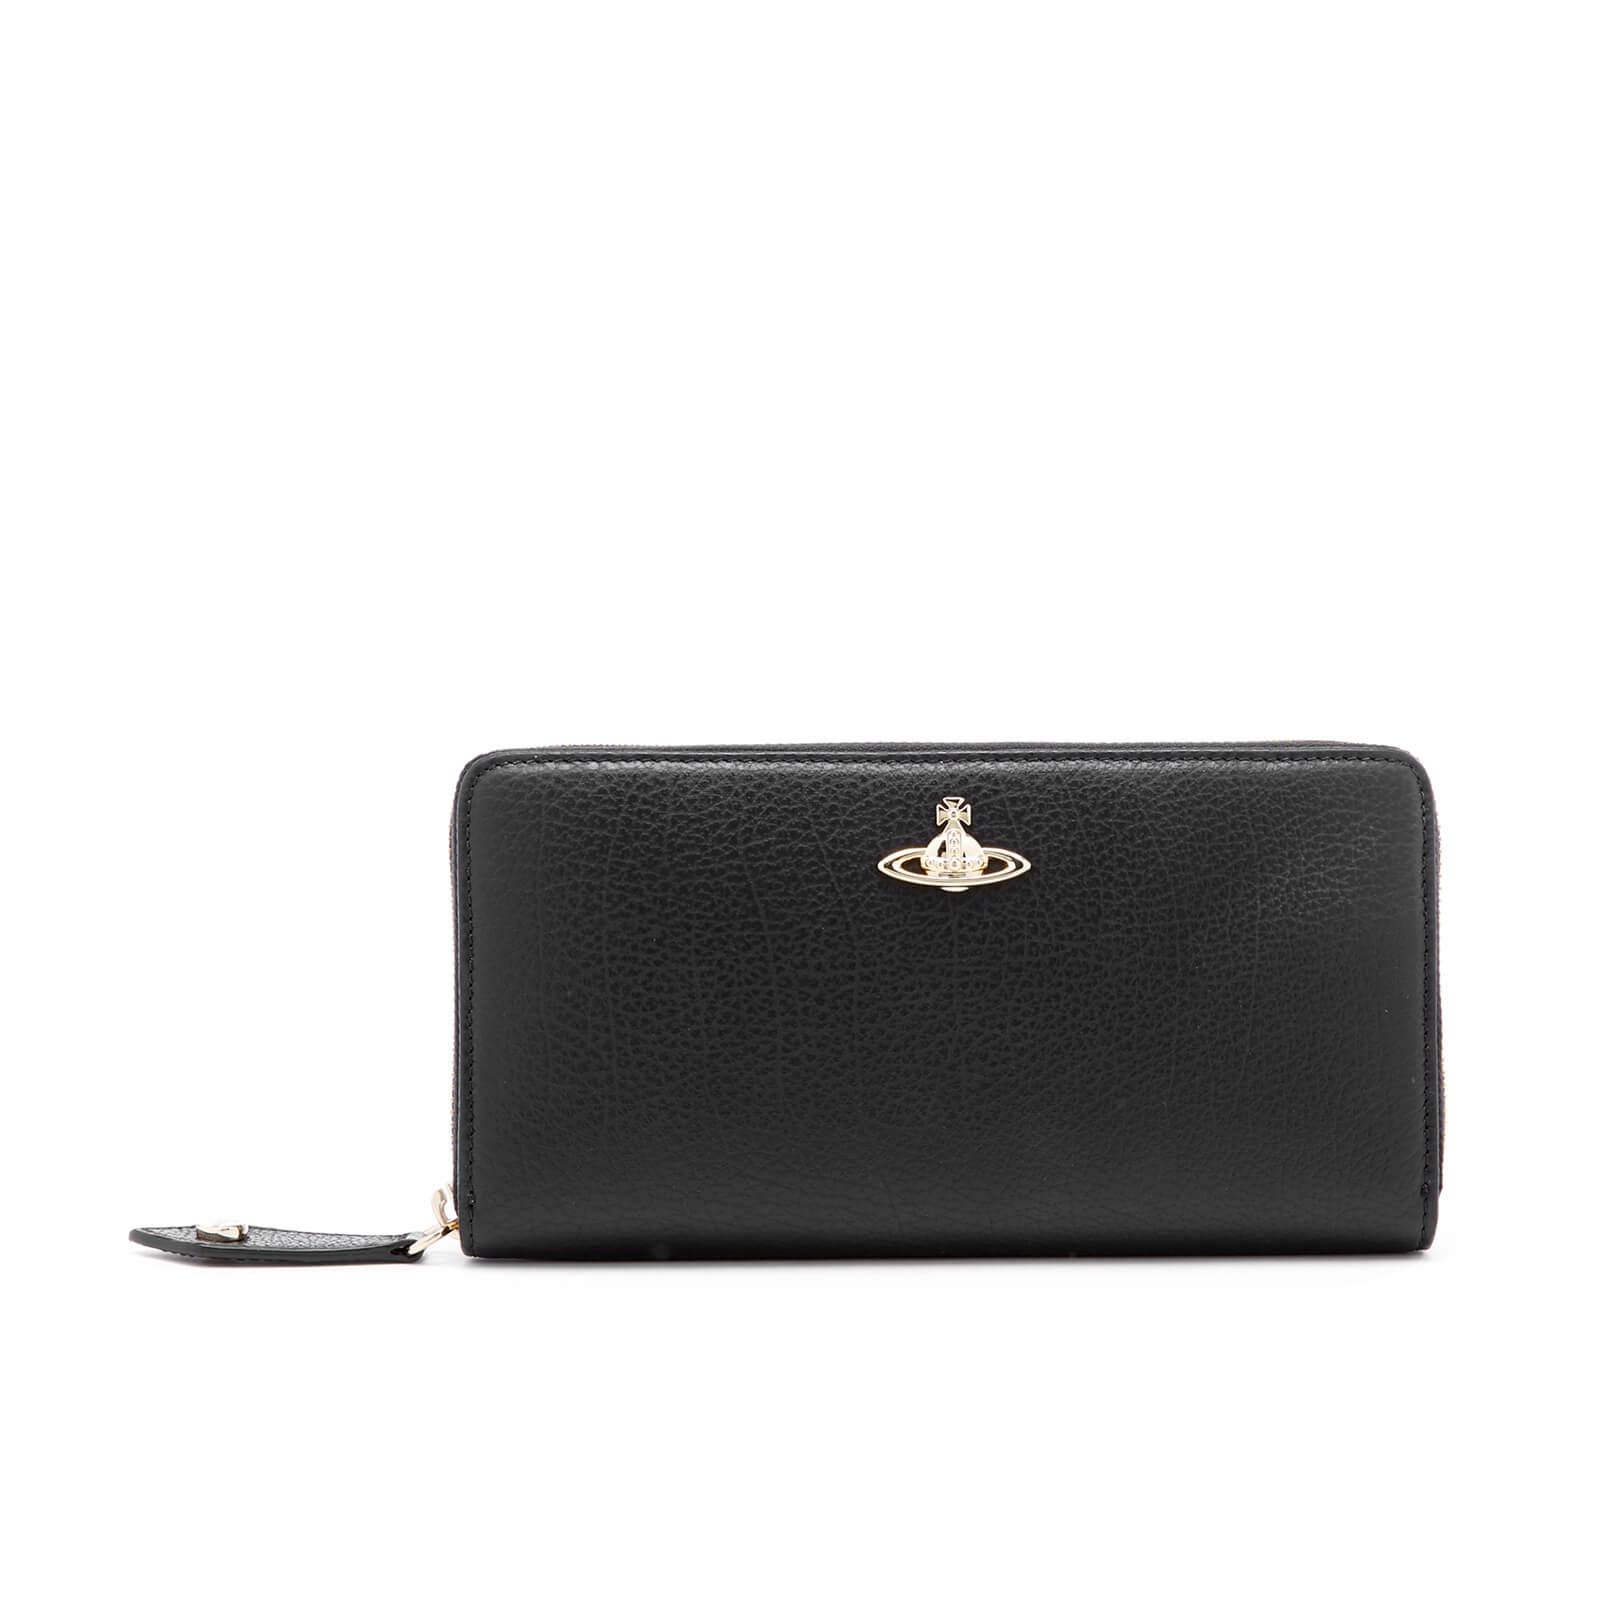 da3f3c9cd6 Vivienne Westwood Women's Balmoral Grain Leather Zip Around Wallet - Black  - Free UK Delivery over £50